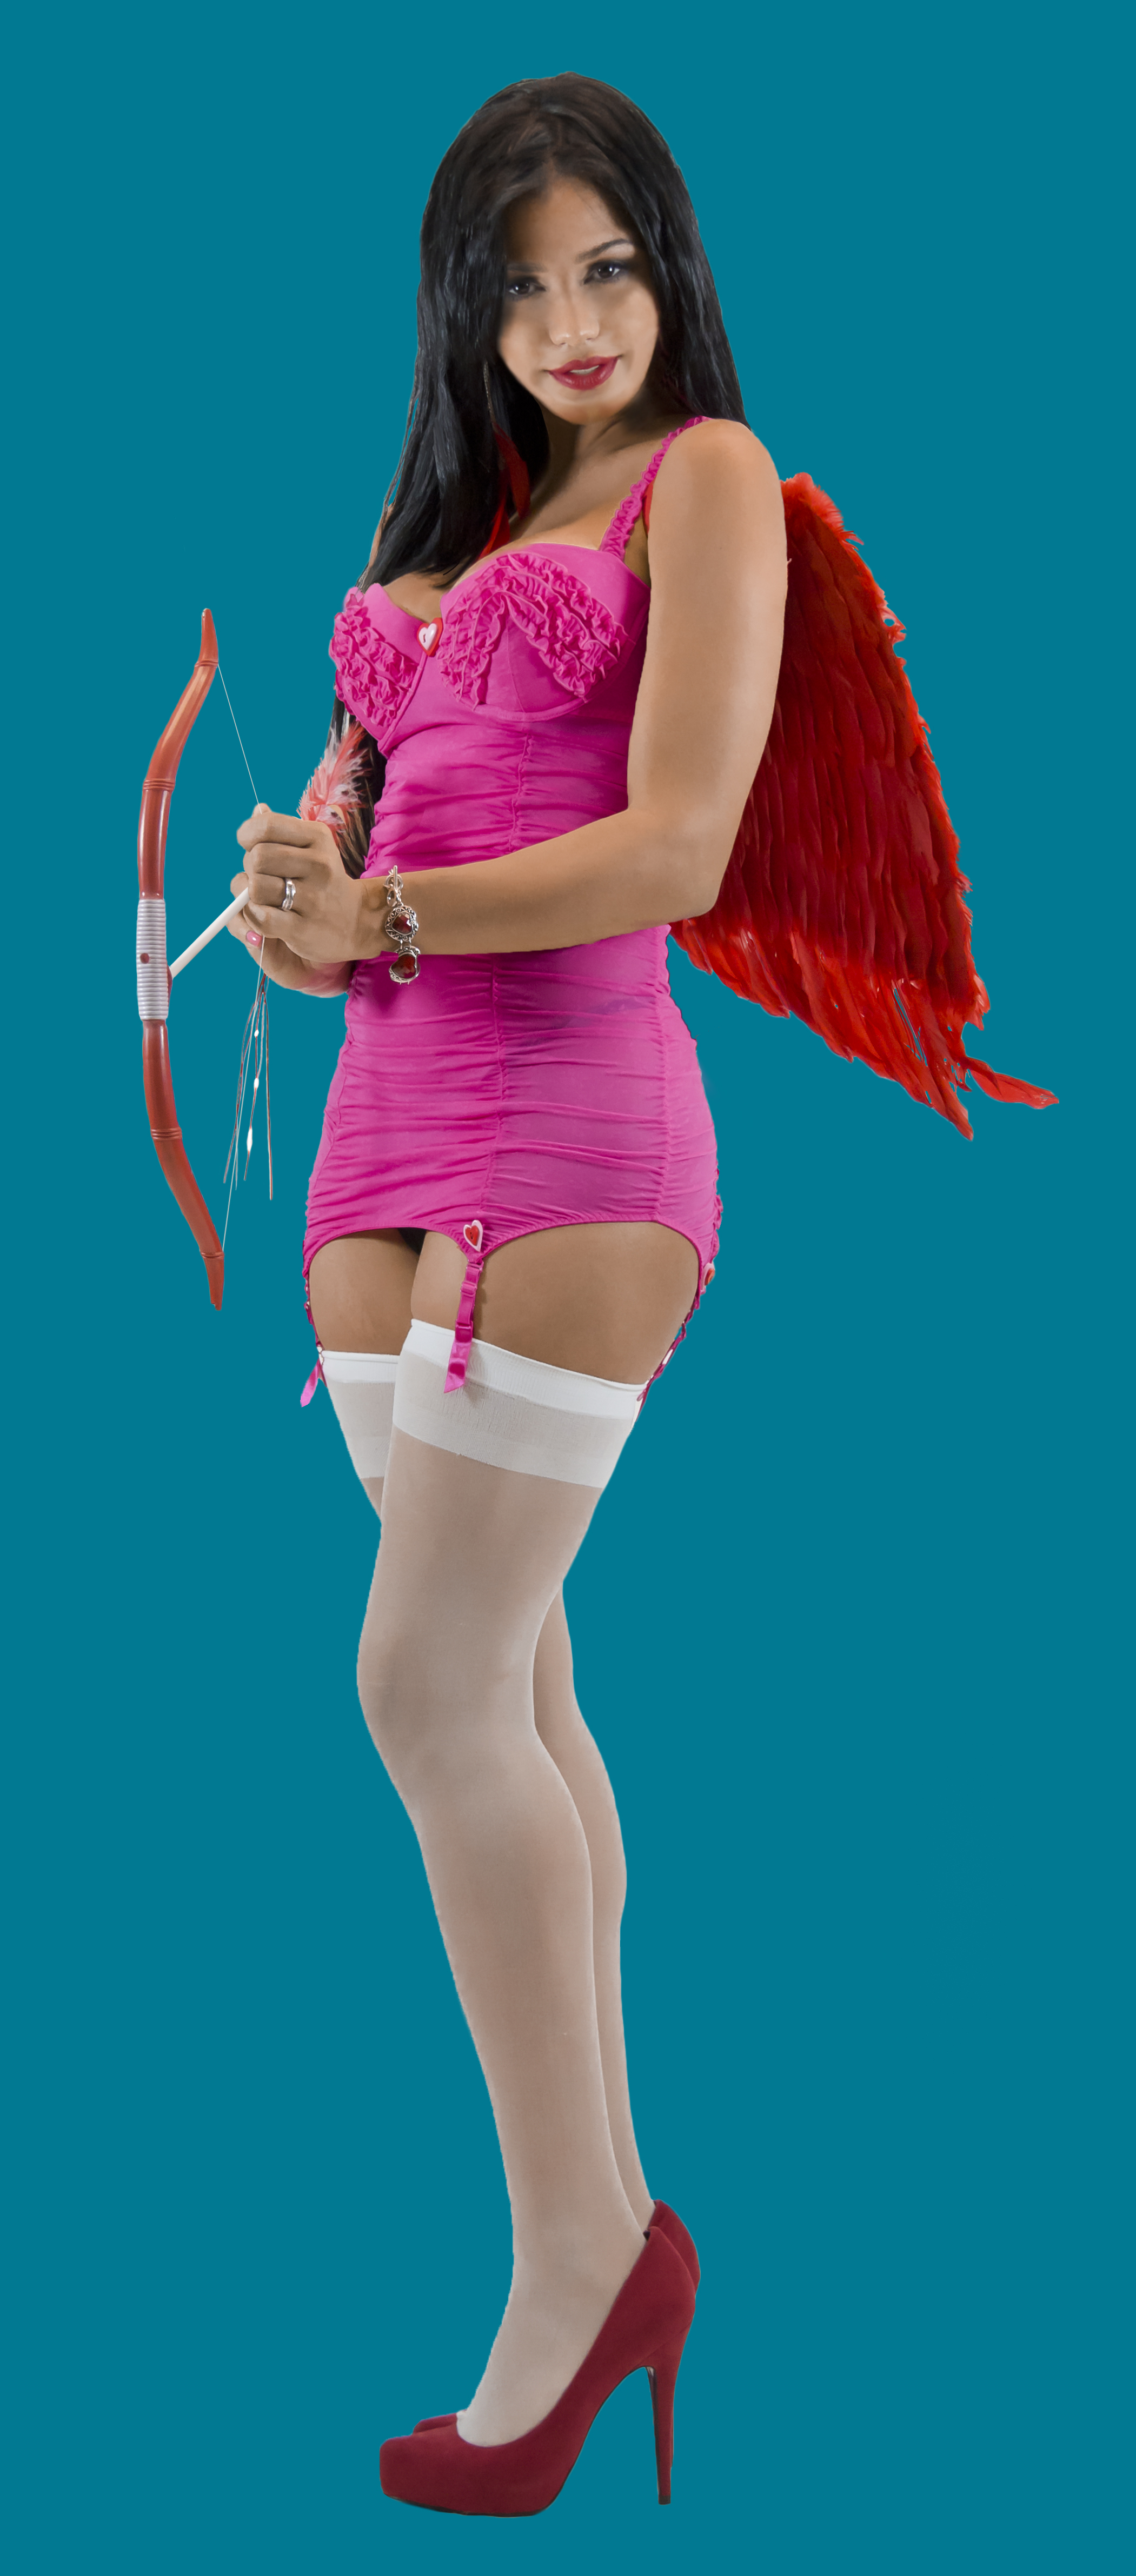 cupid-girl.jpg